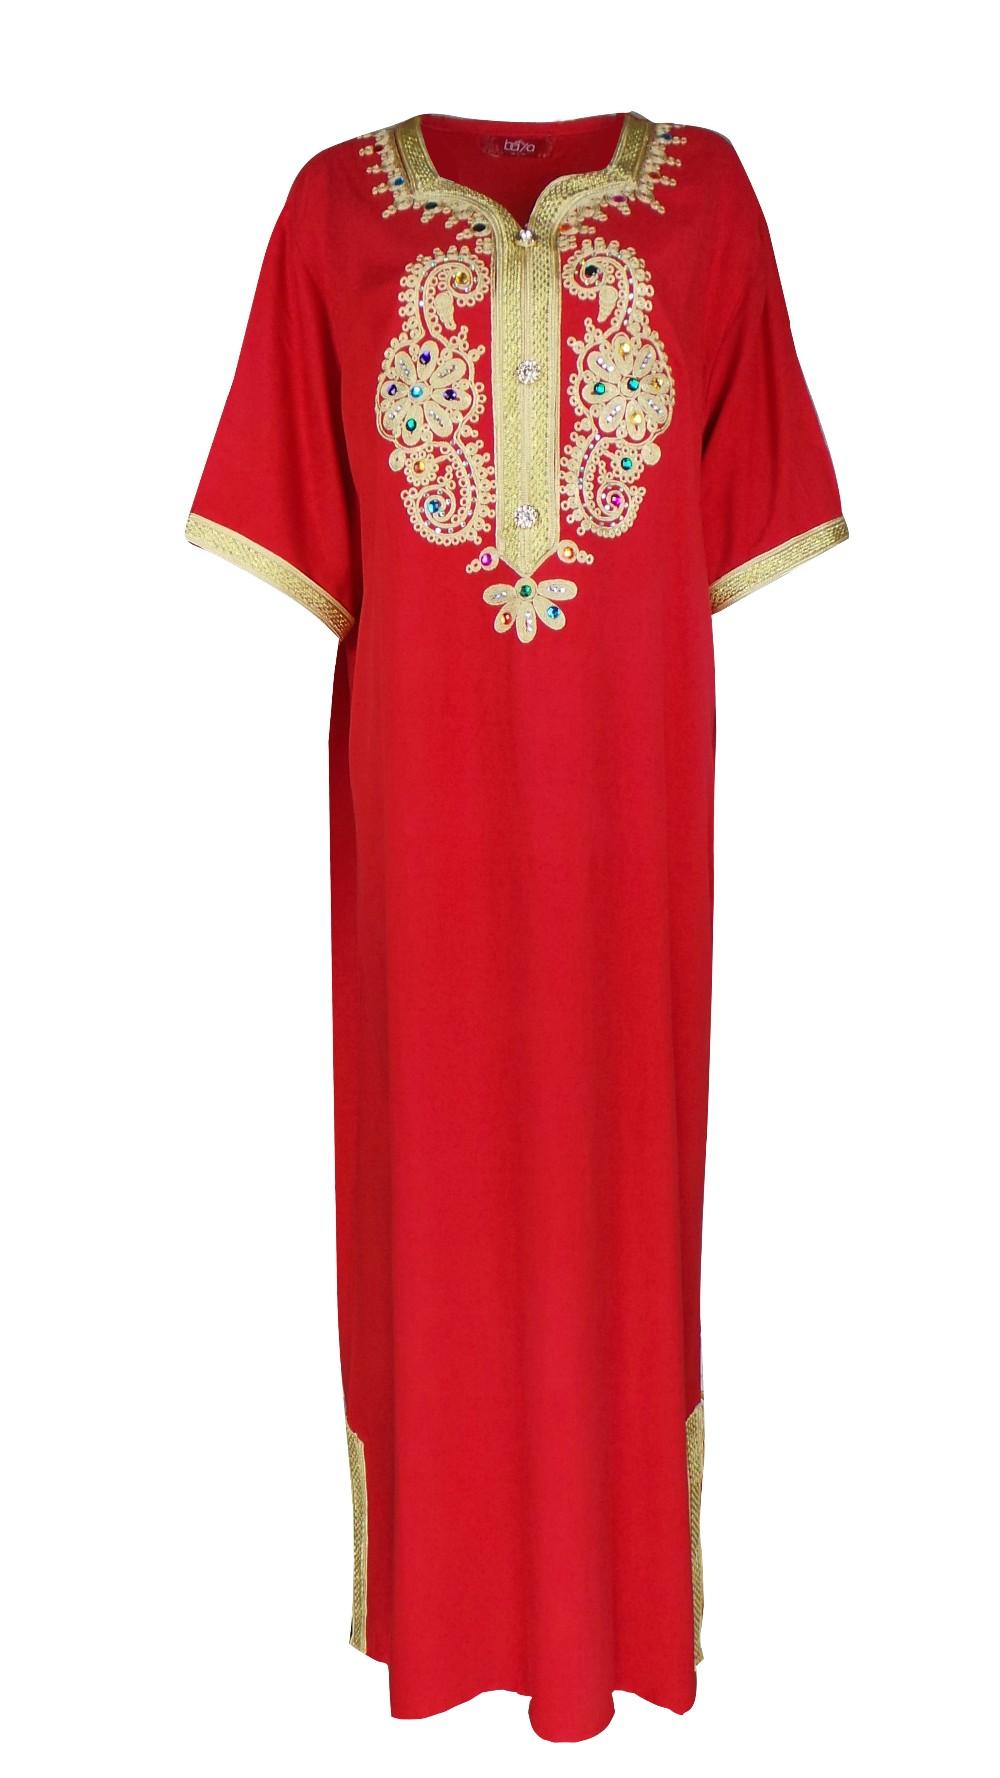 Muslim Women long sleeve long dress islamic clothing Dubai kaftan caftan turkey moroccan maxi / long Abaya turkish fashion 1606